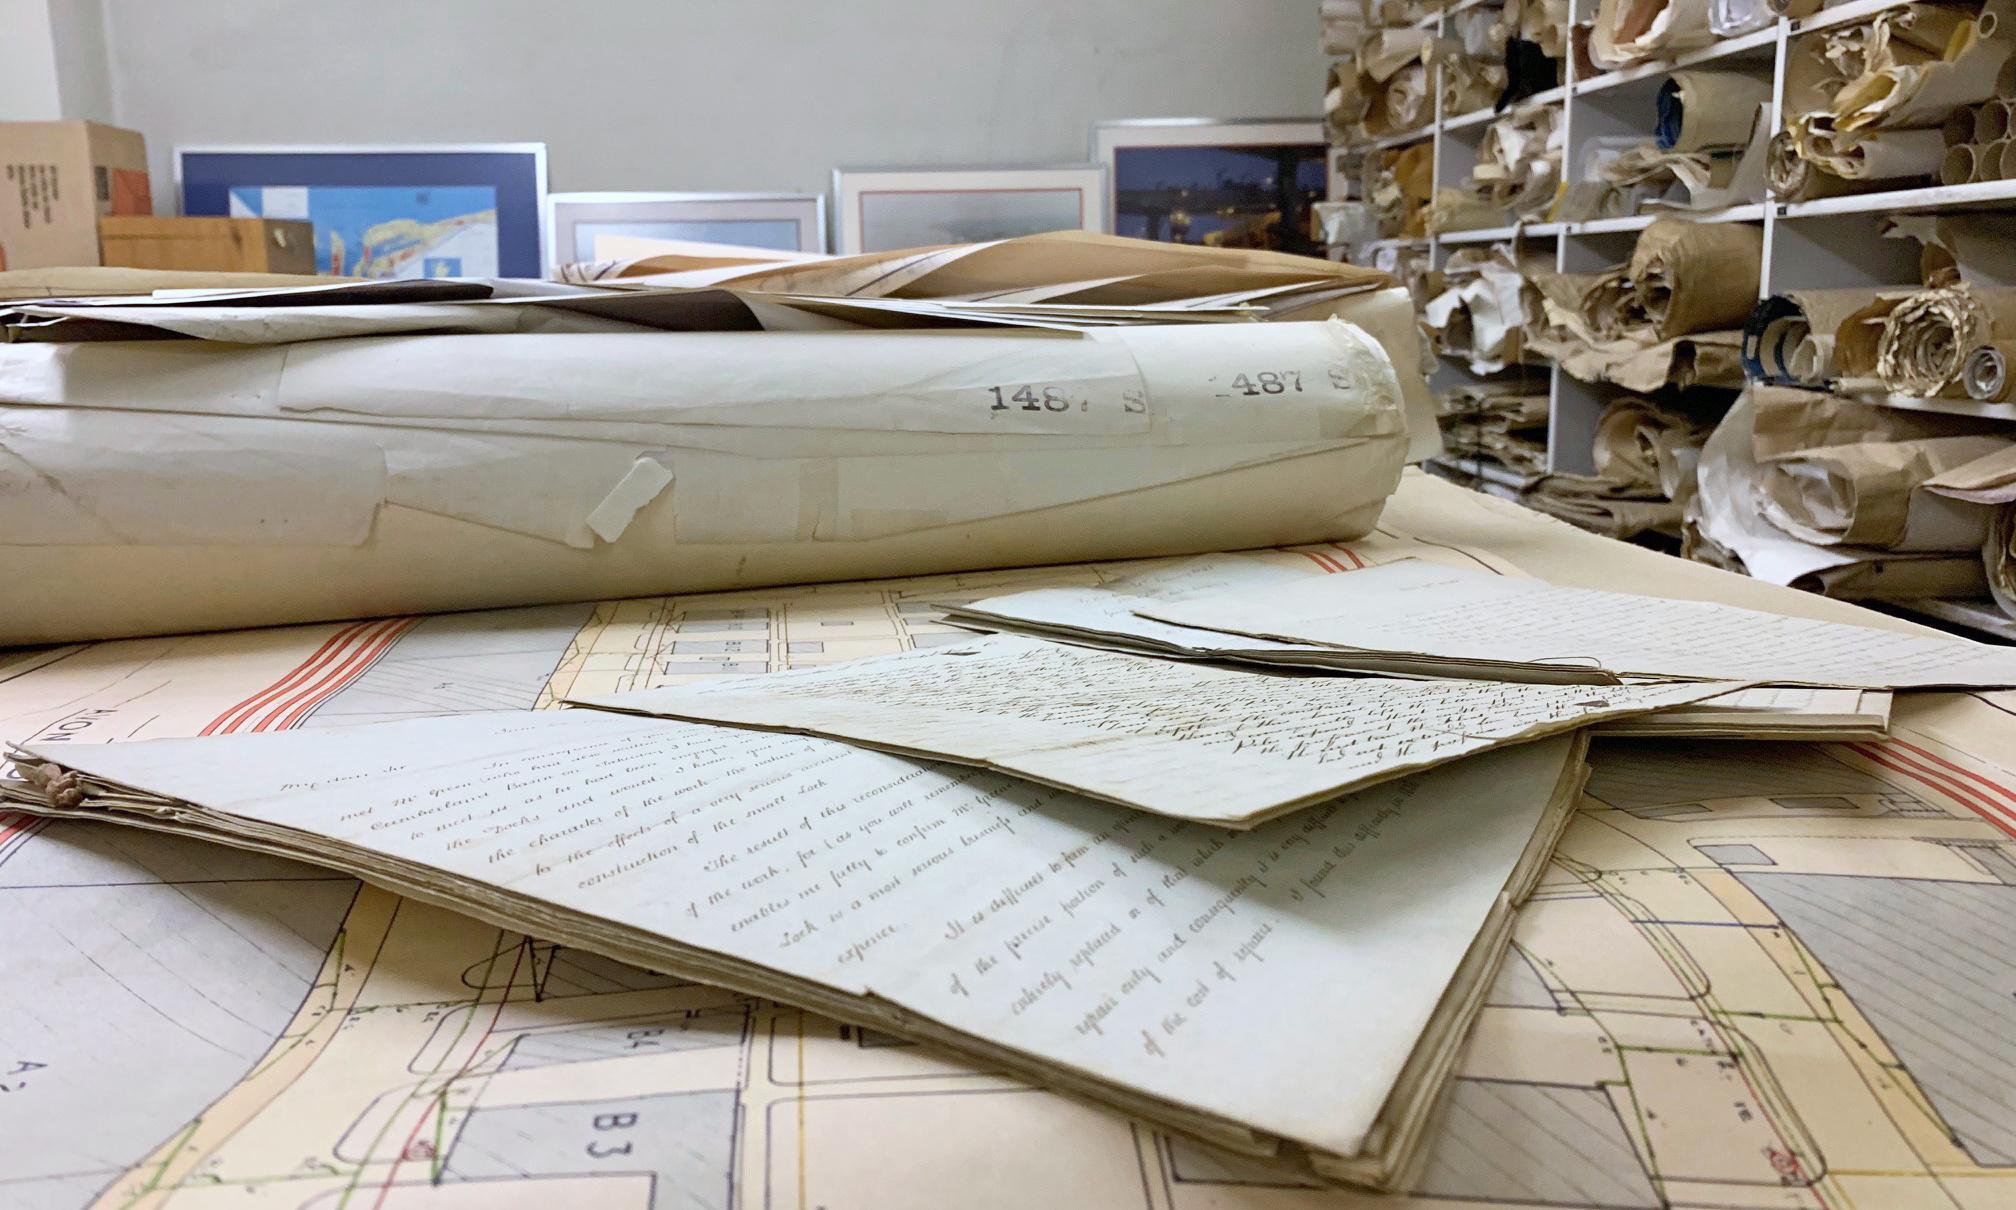 Letters reveal Isambard Kingdom Brunel's pollution concerns